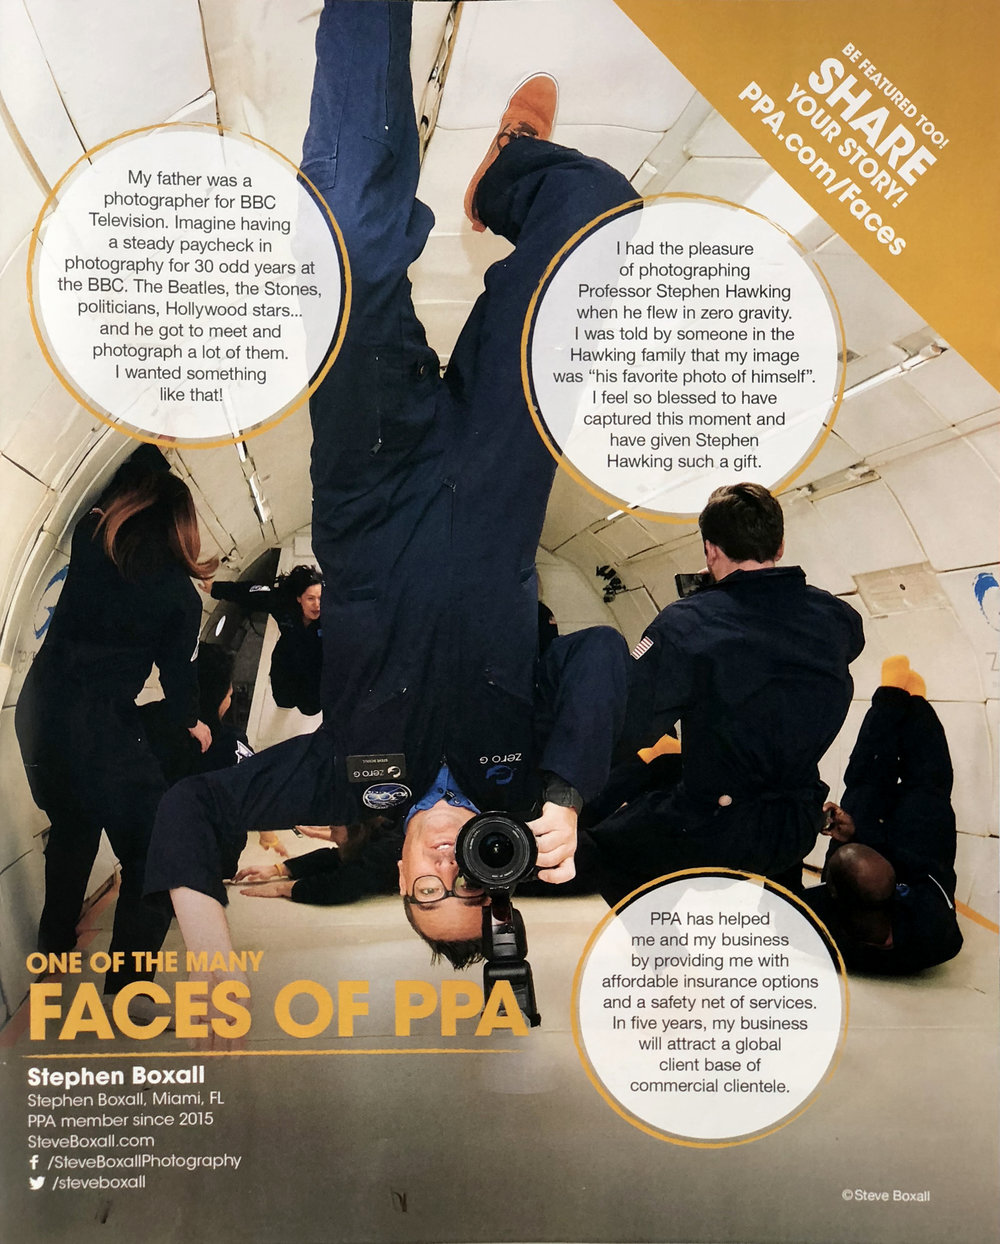 Steve Boxall - Faces of PPA Tearsheet